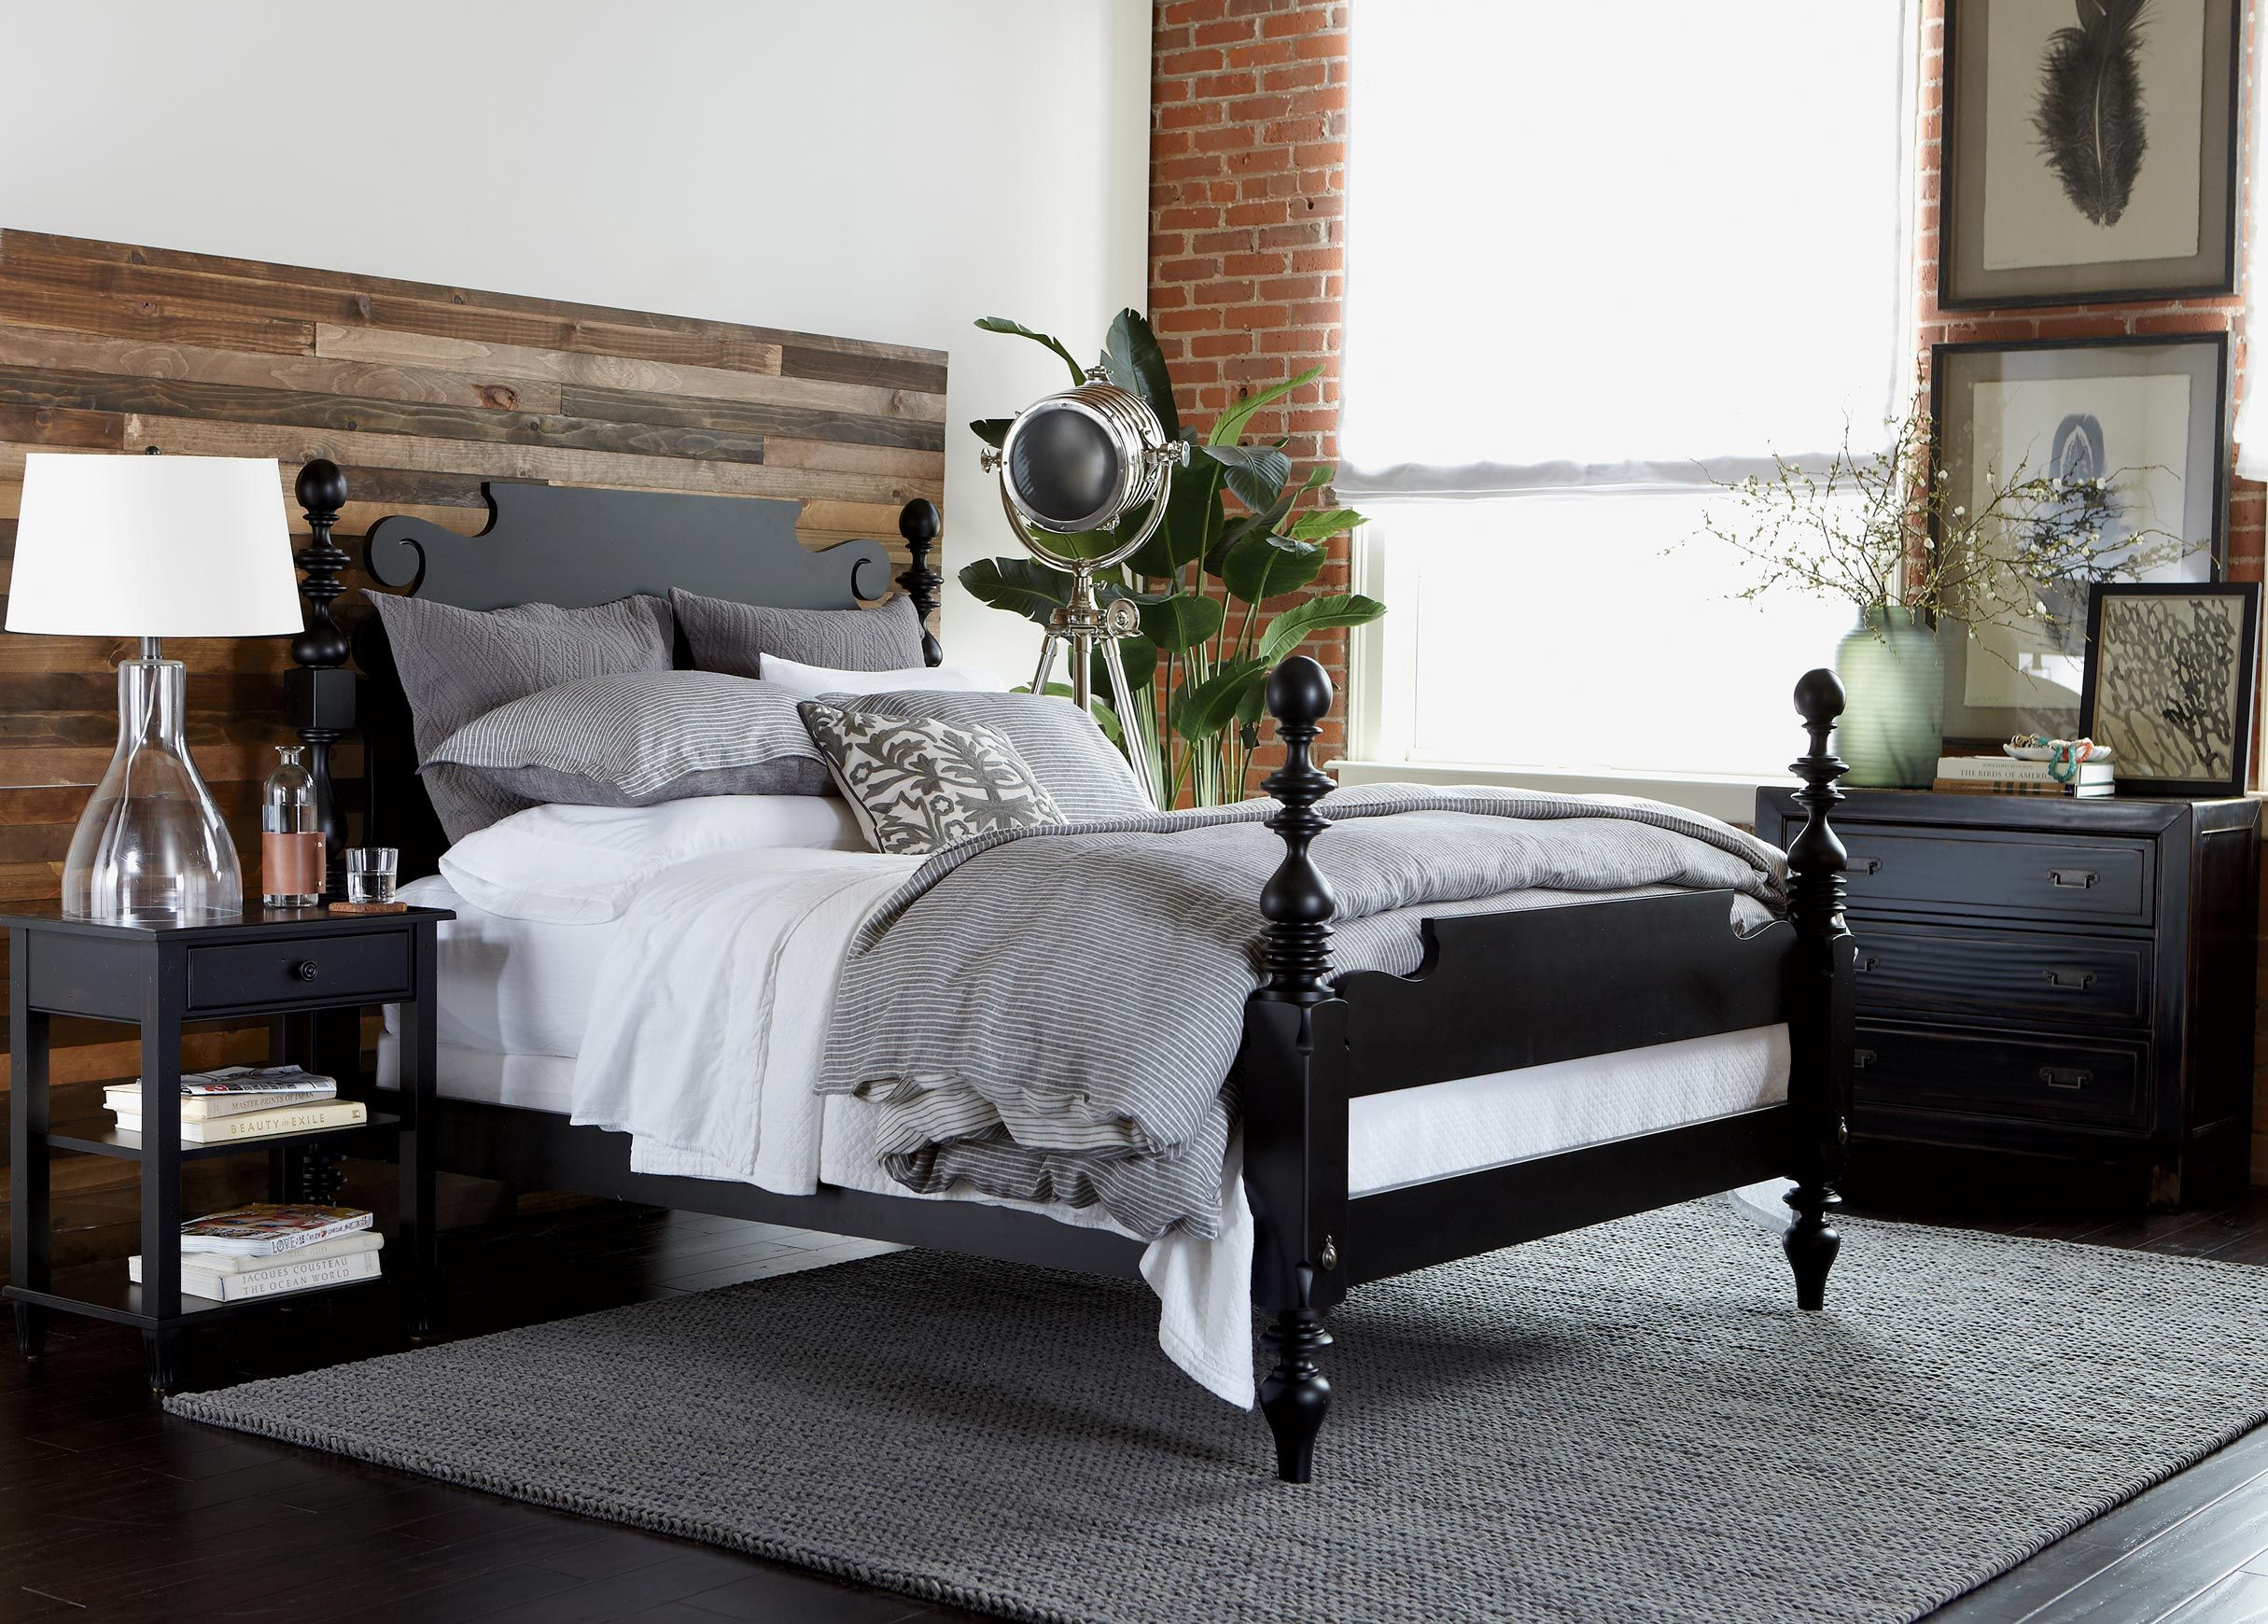 Premium Blend Bedroom Ethan Allen (With images